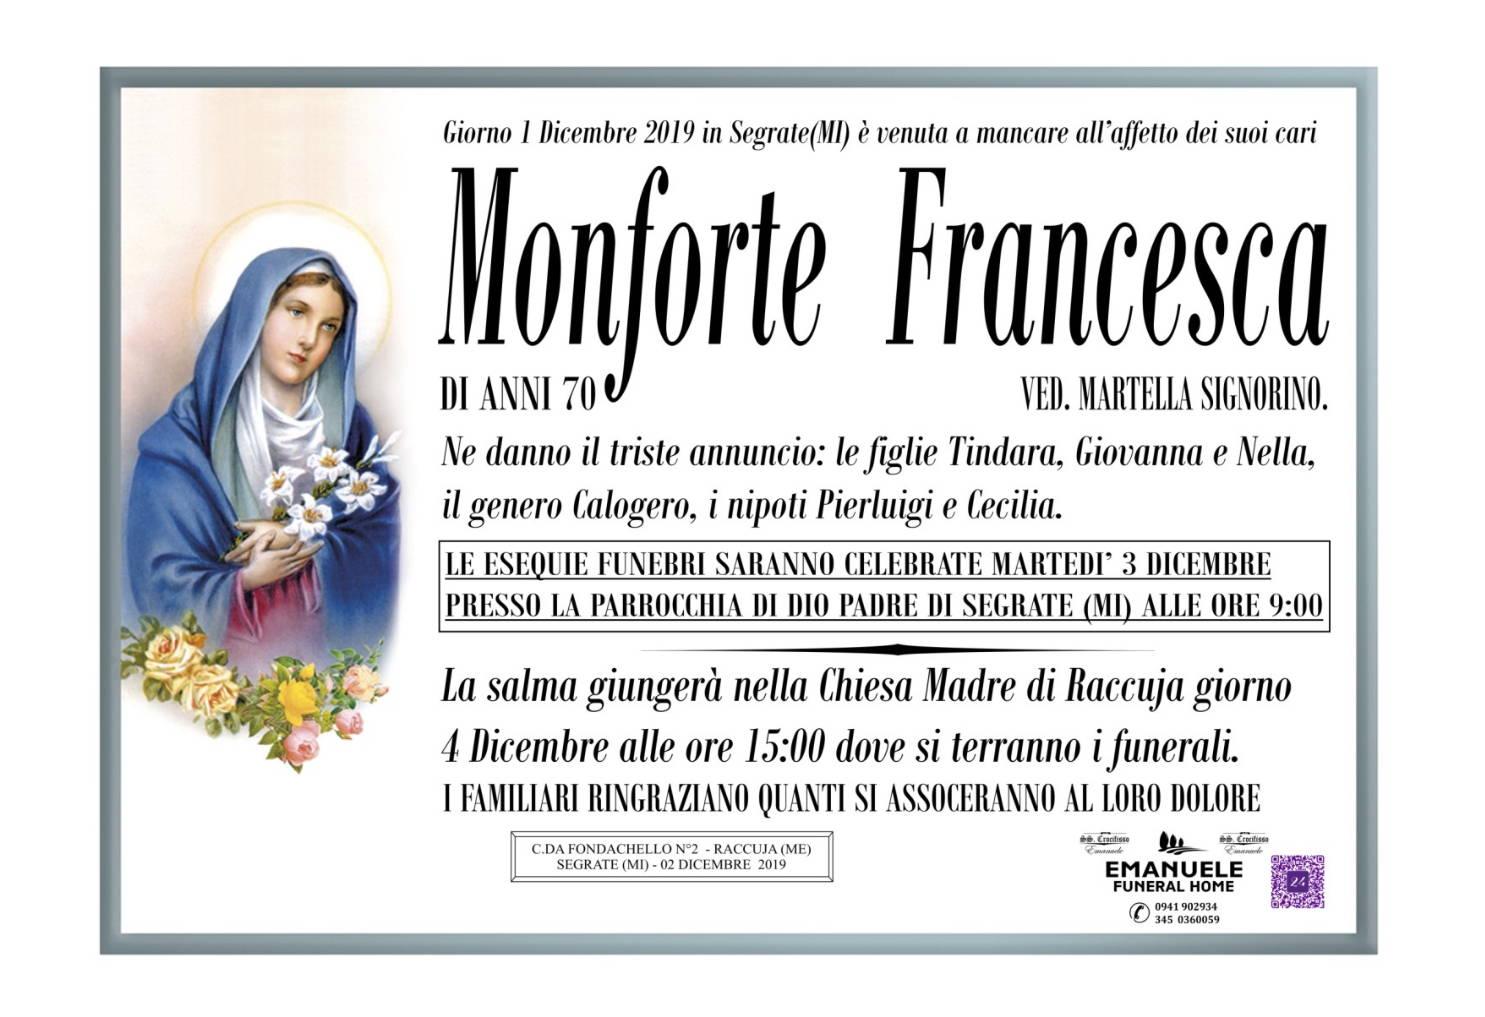 Francesca Monforte